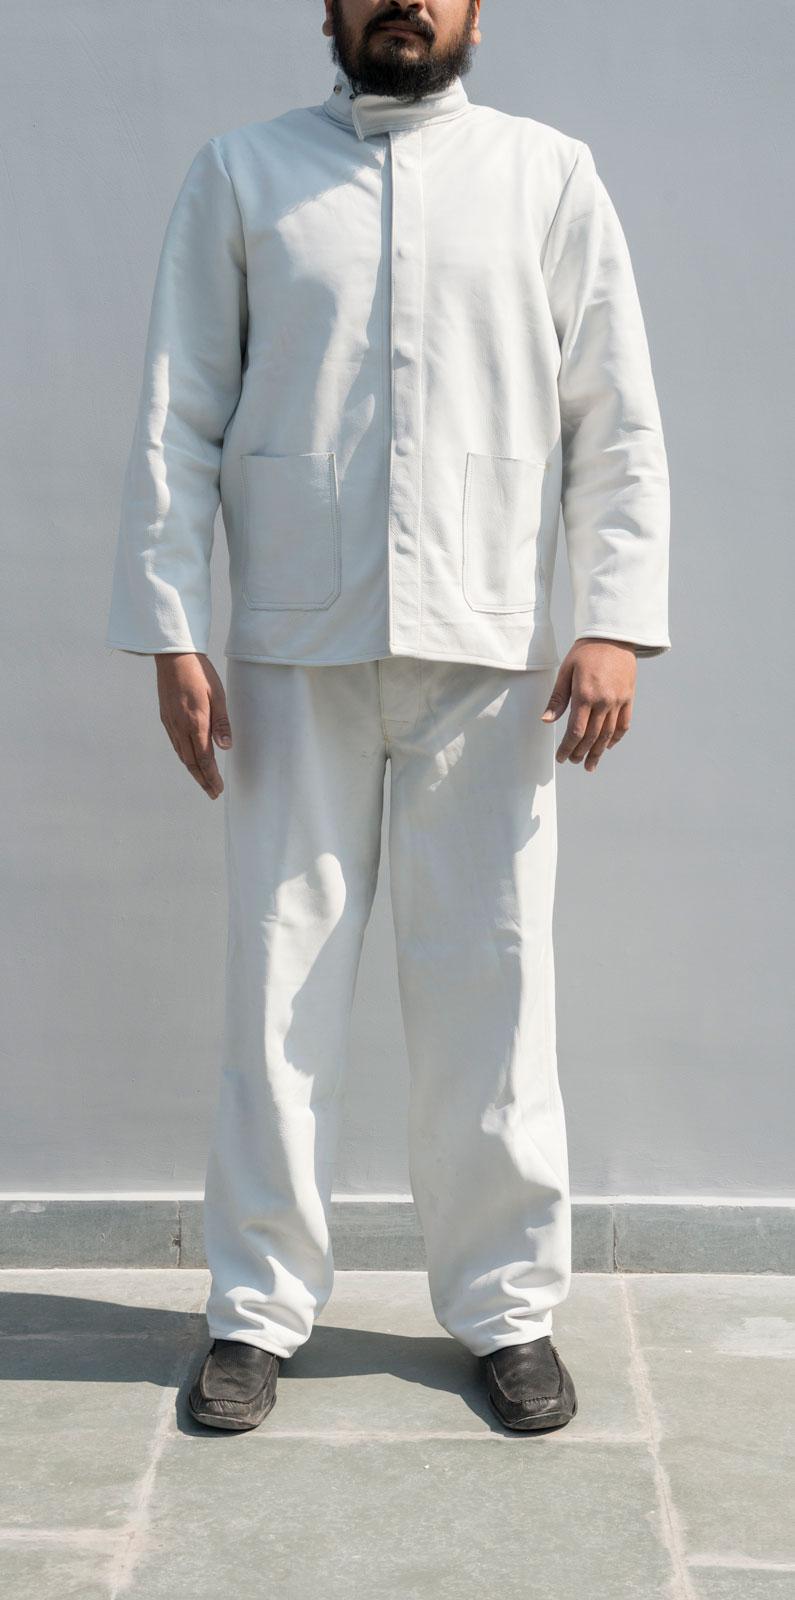 Copy of Full Body Suit